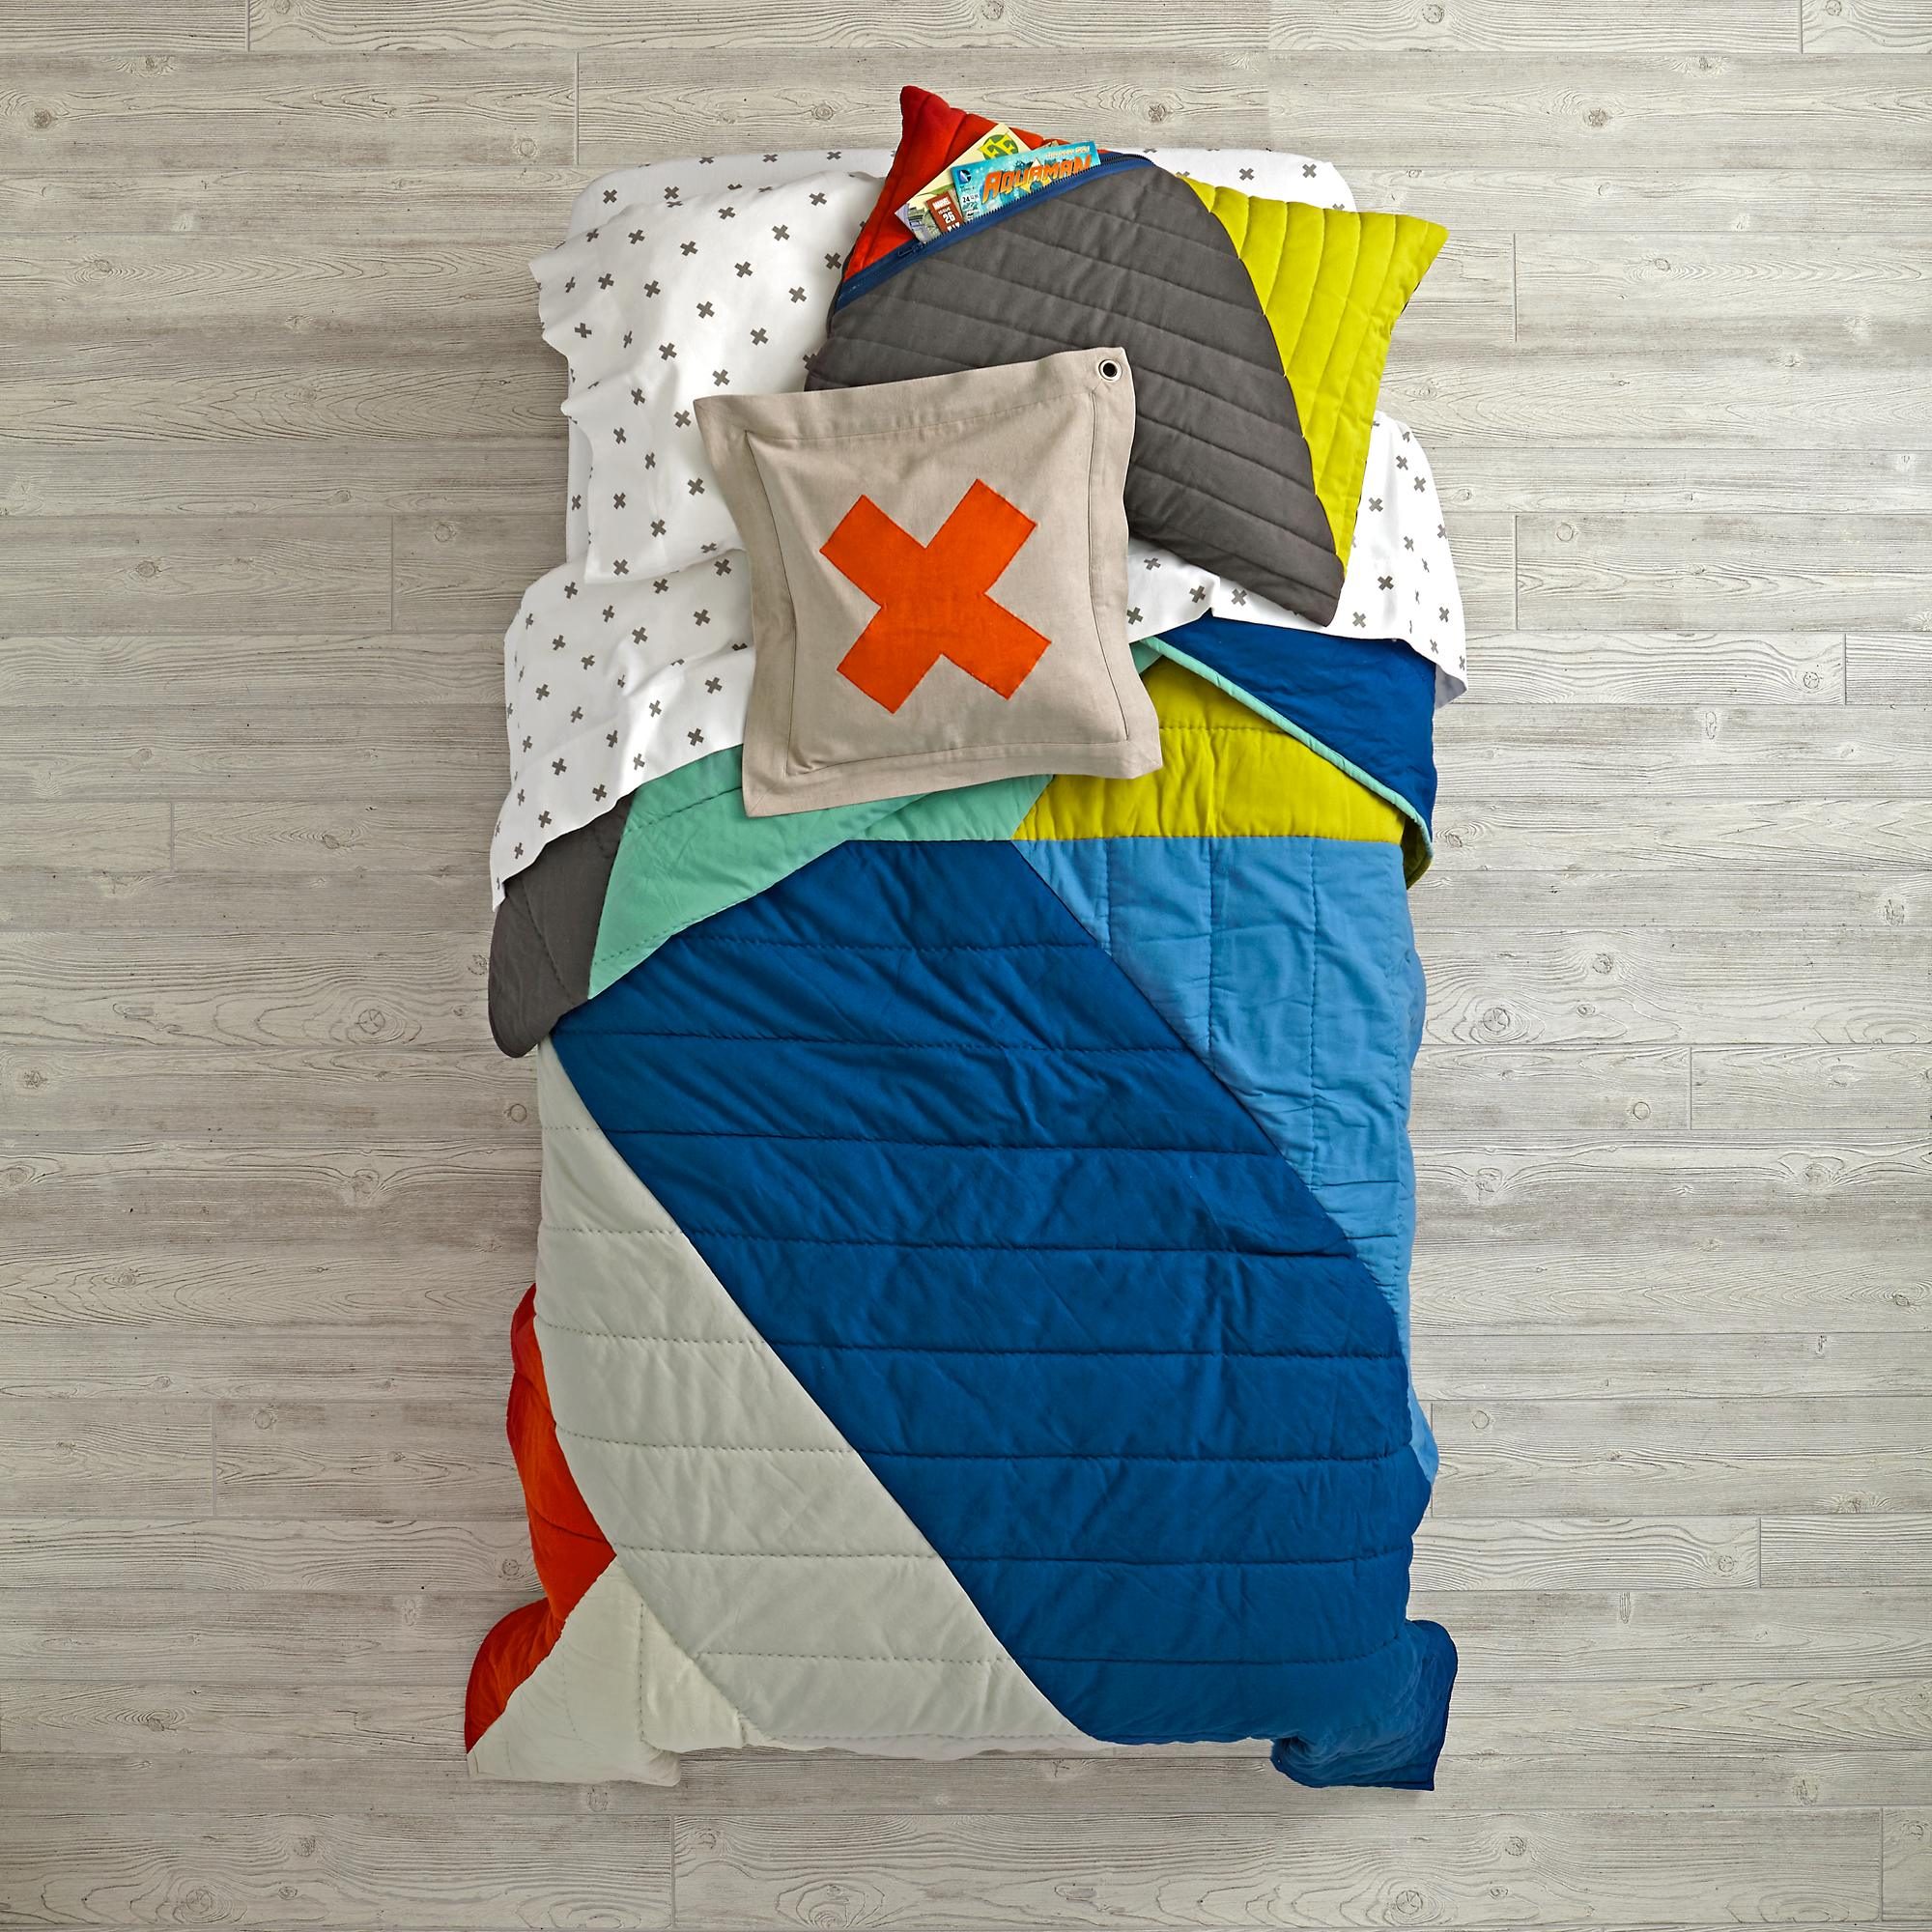 angular-bedding_1.jpg